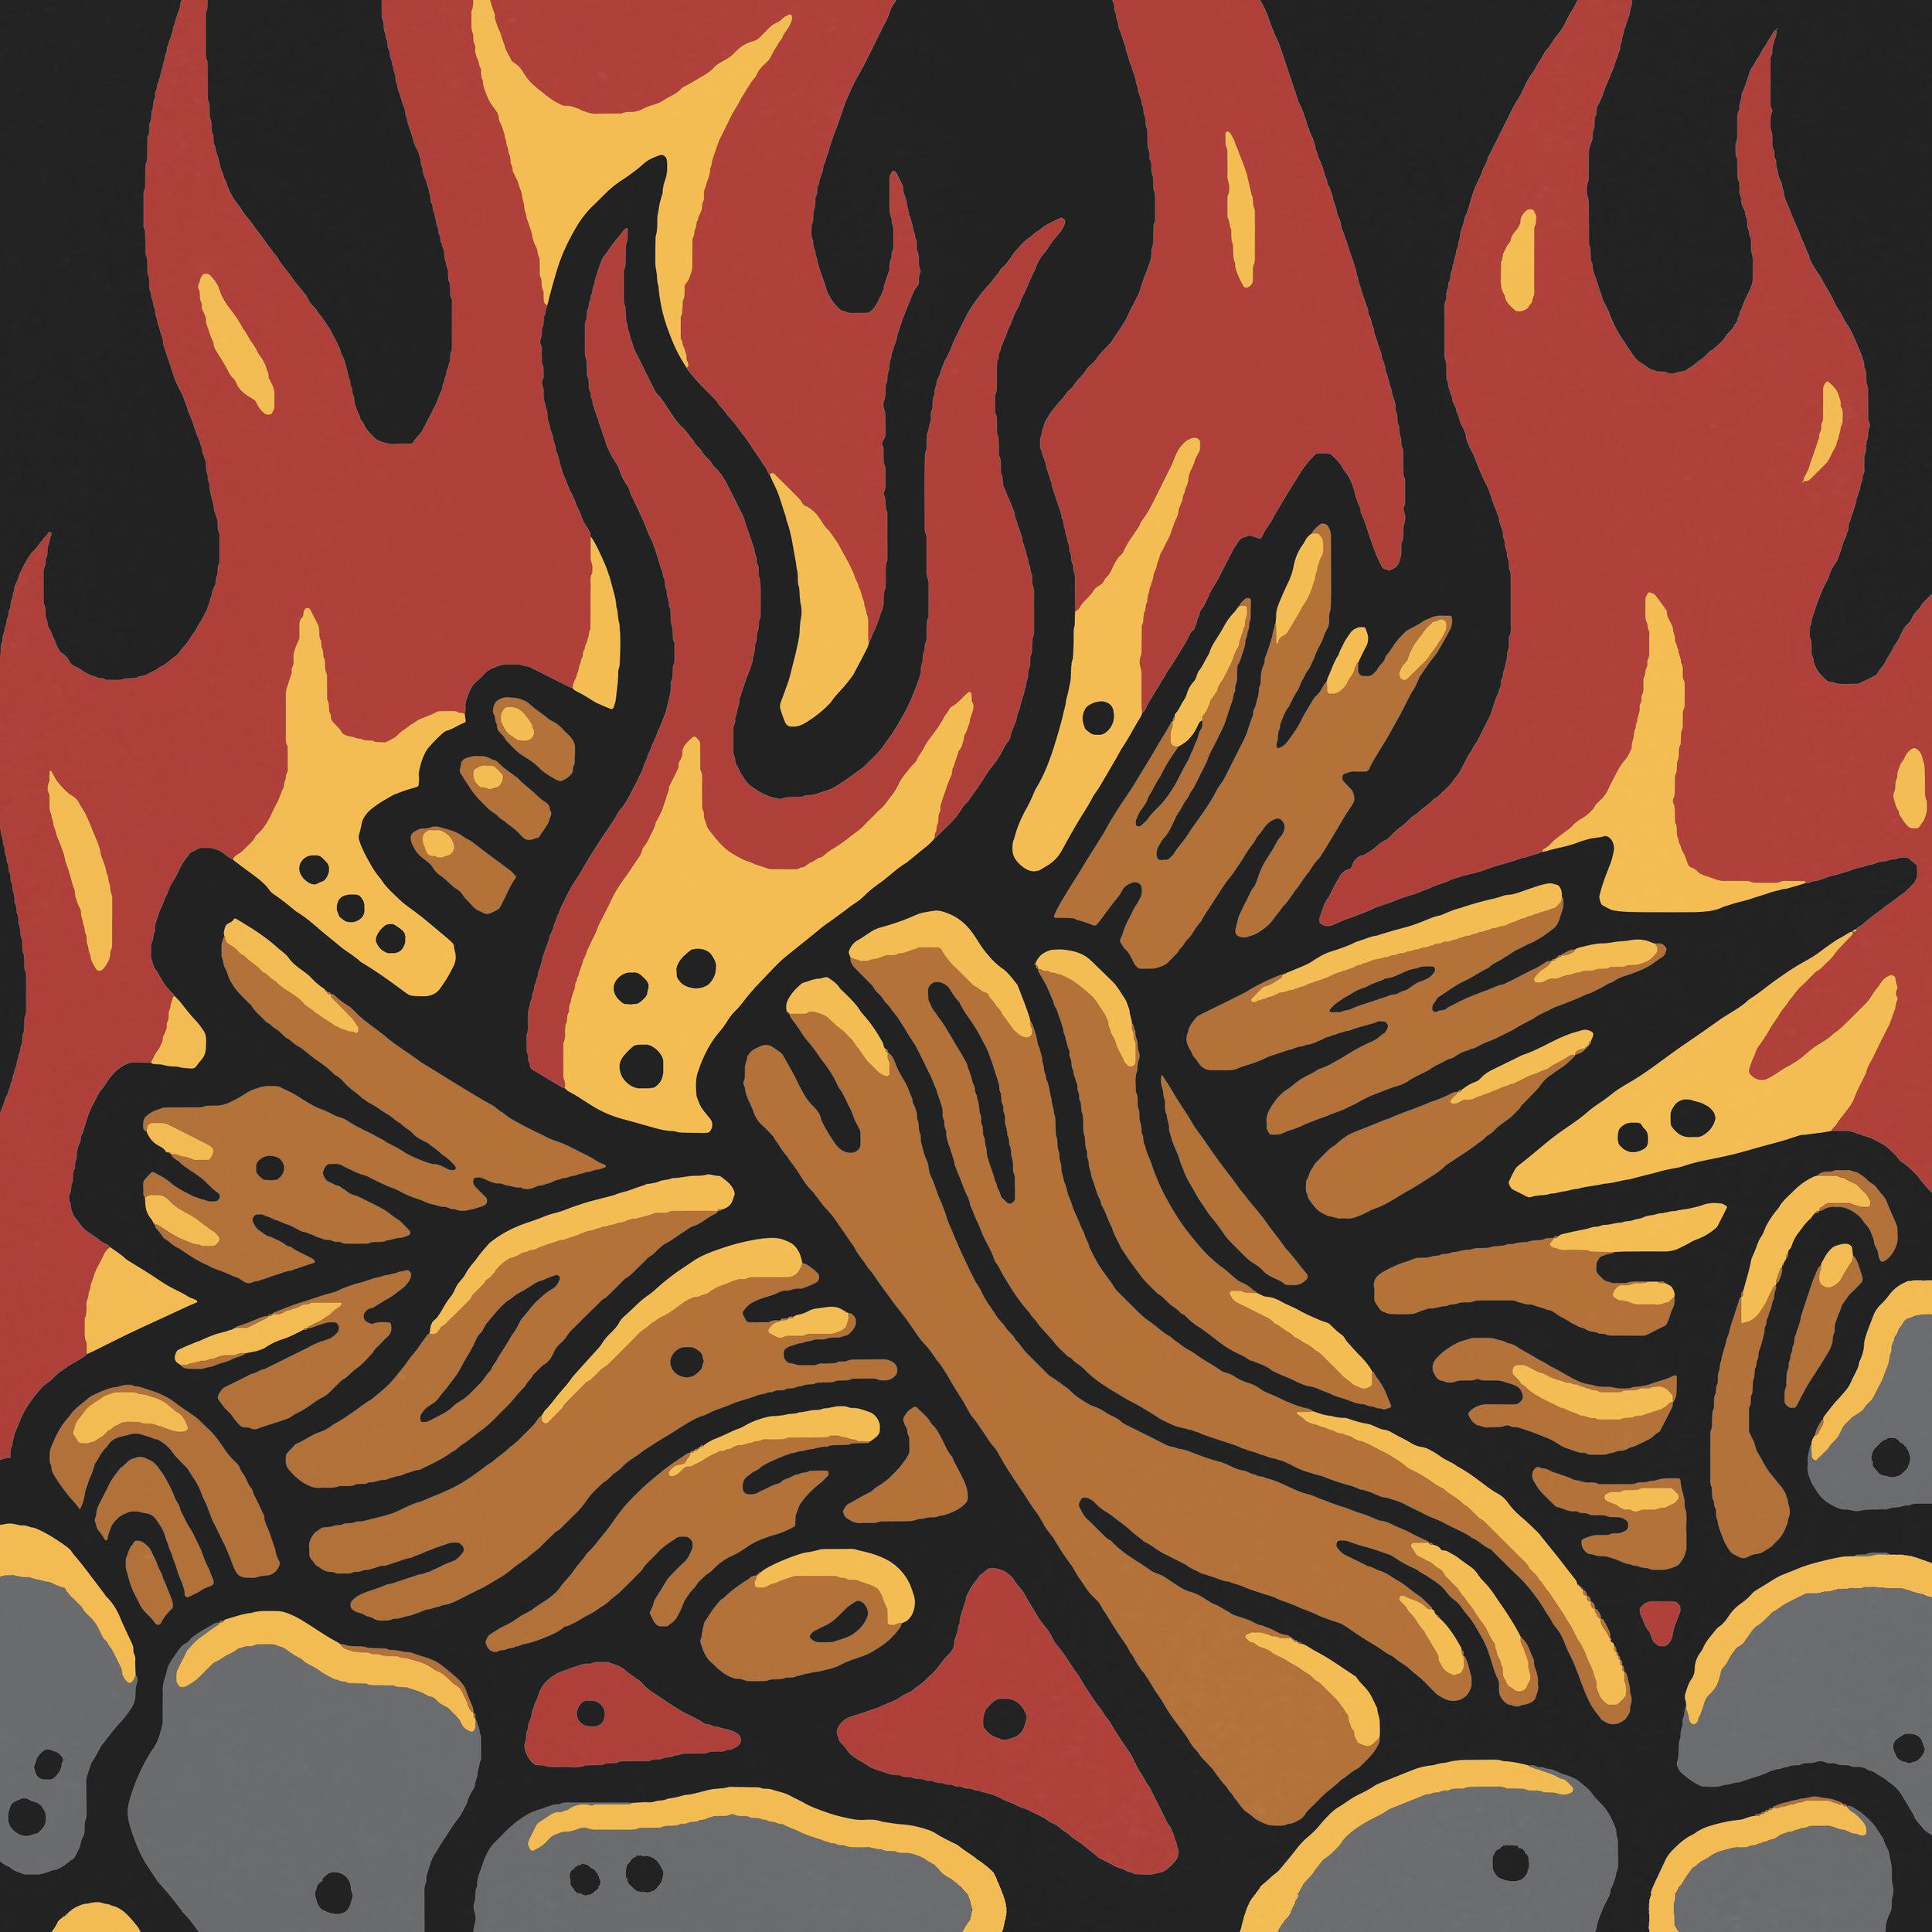 INSTA-FLAMES1.jpg